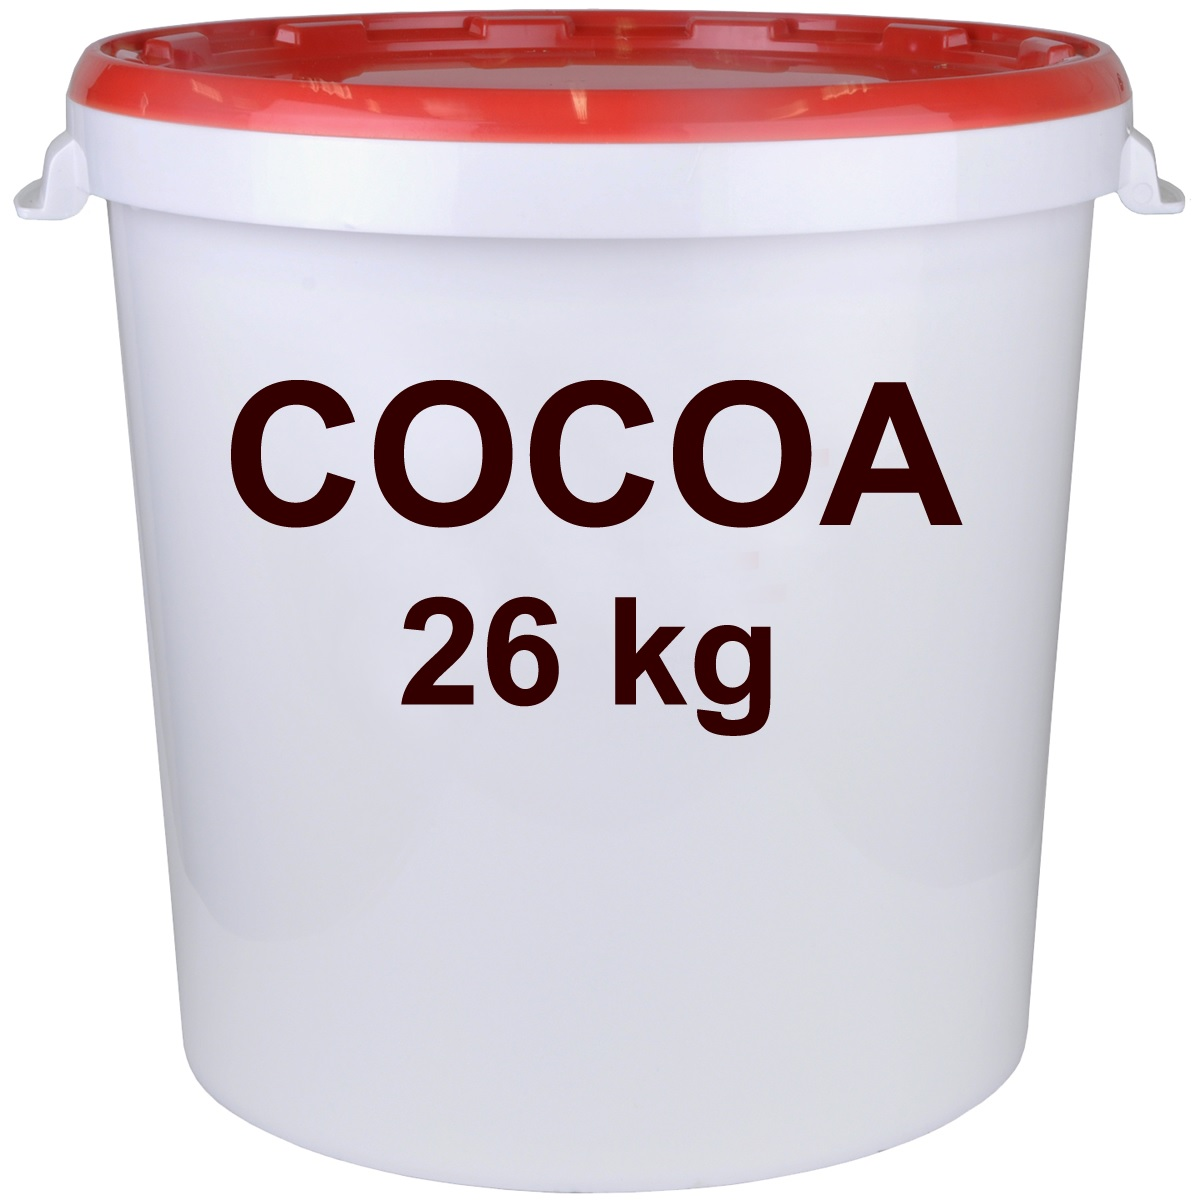 Limus Cocoa Eco Hink